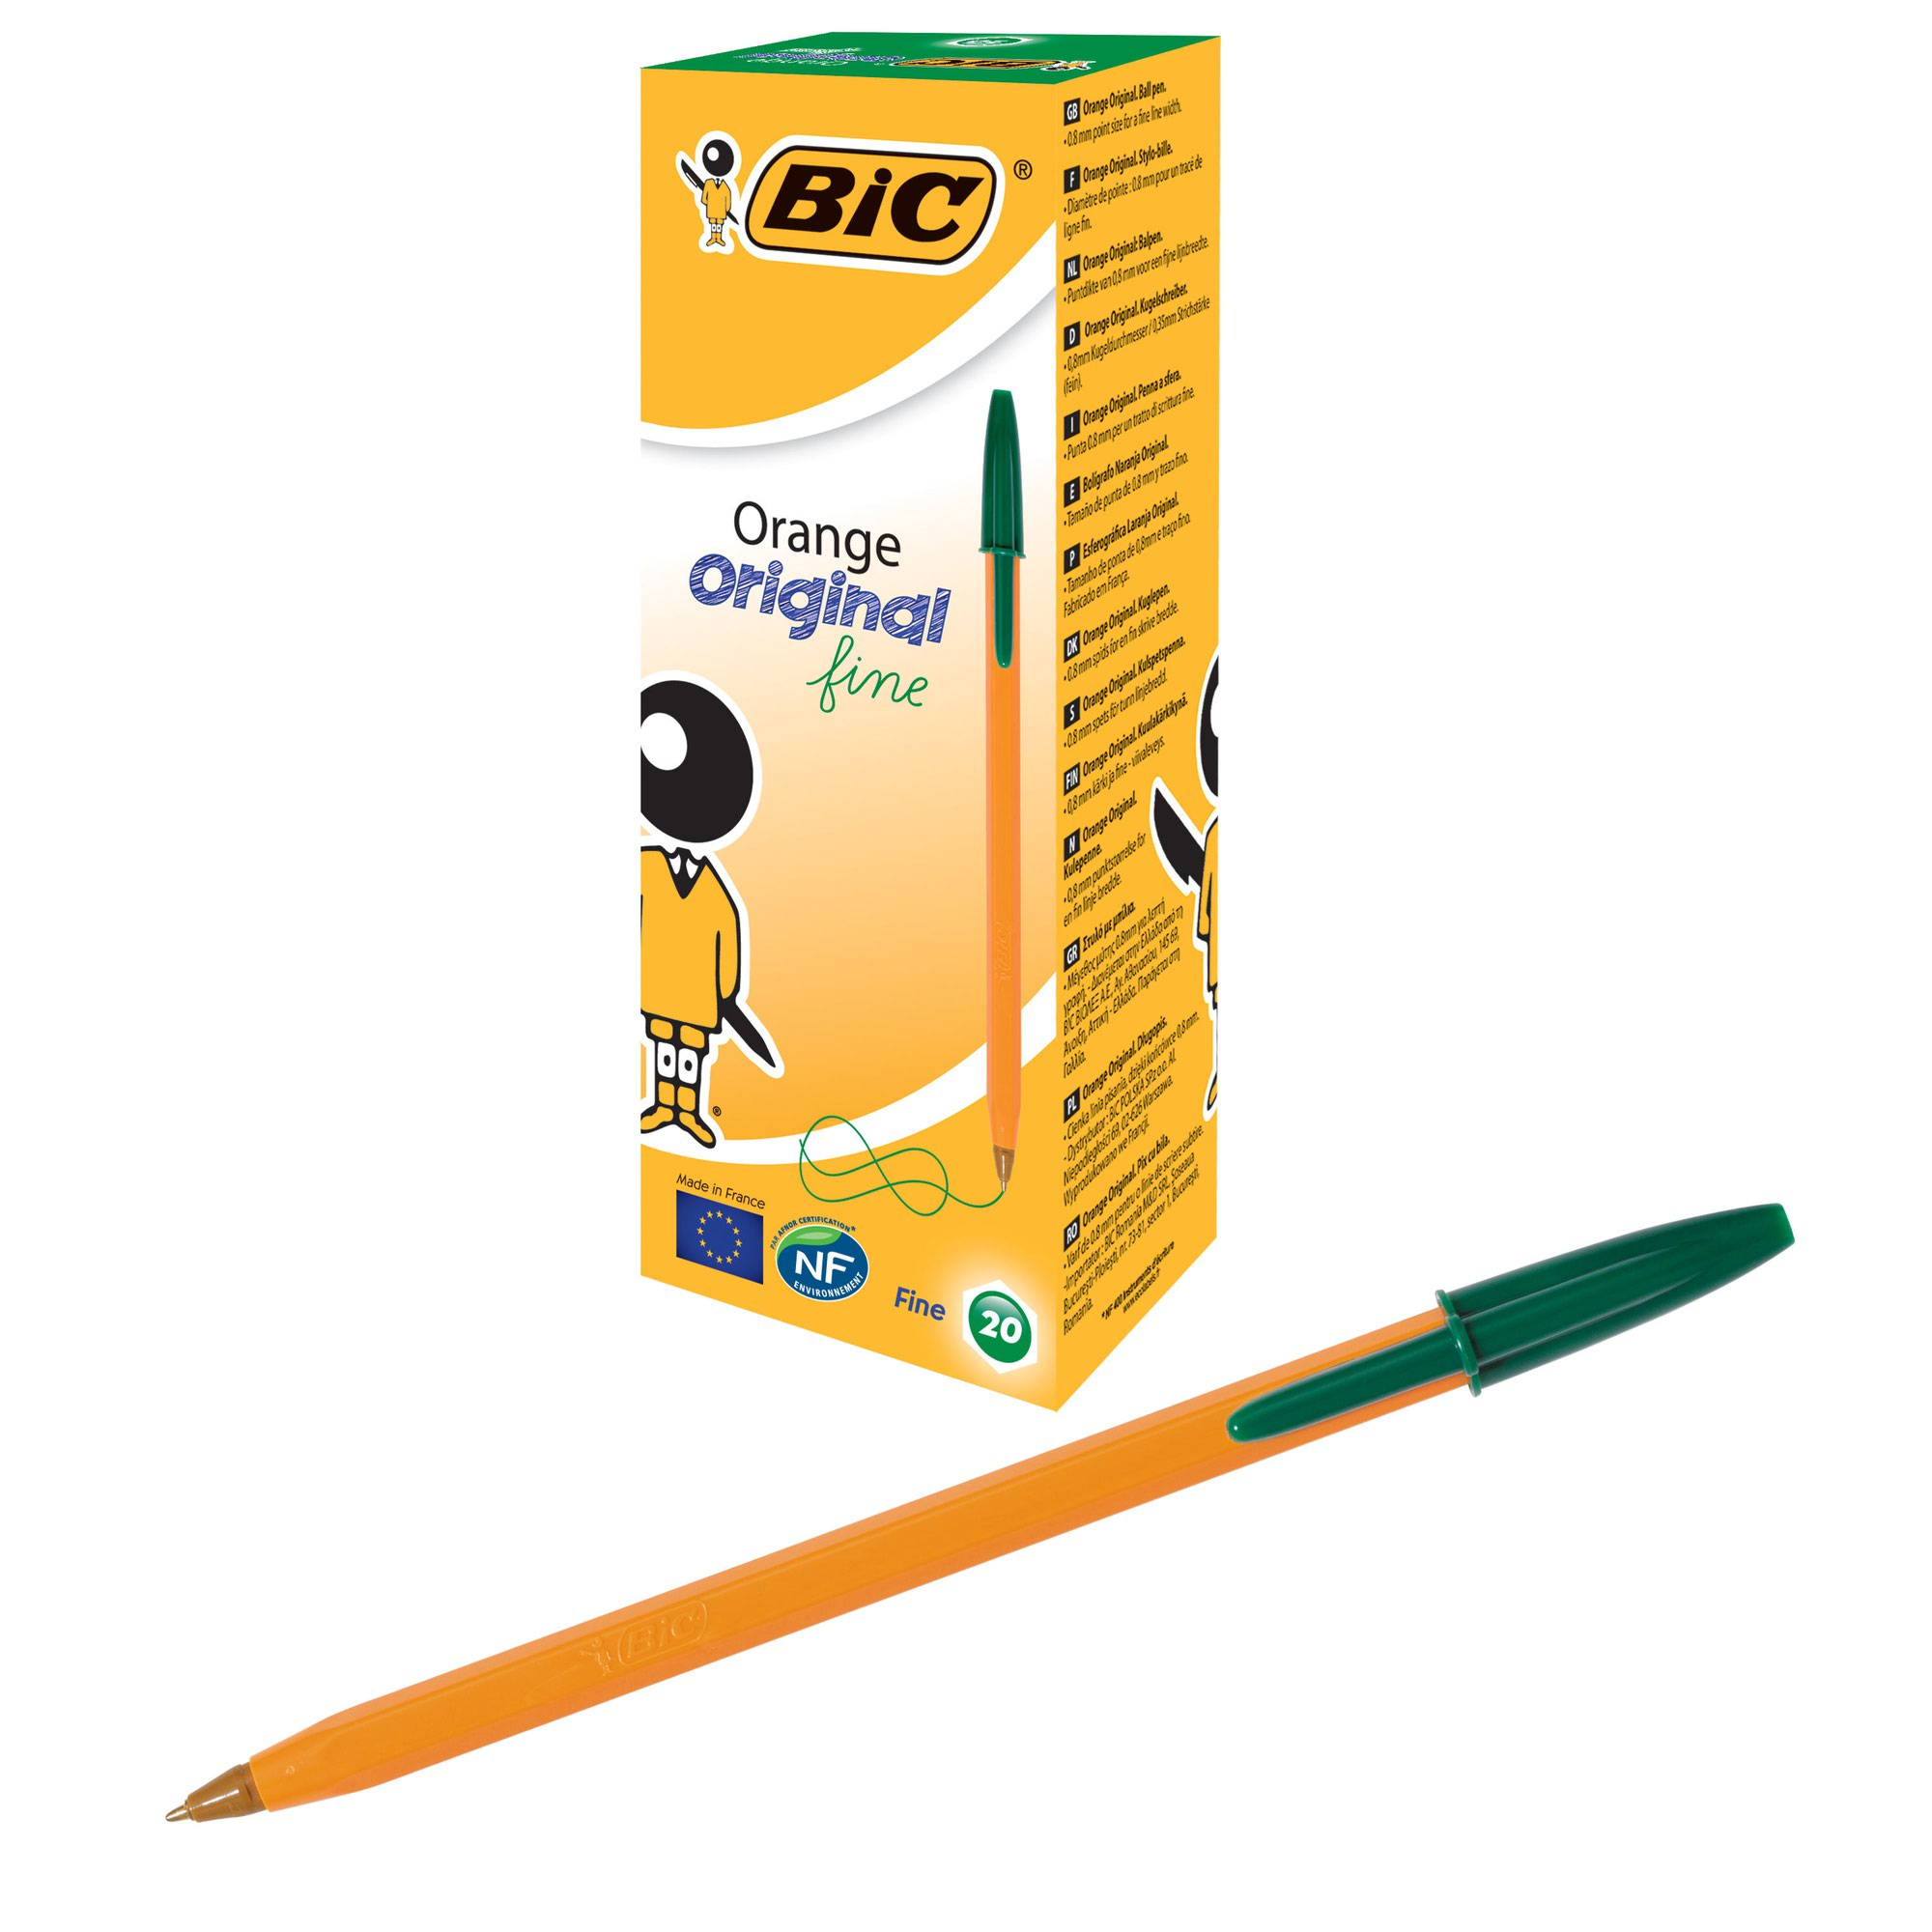 Image for BIC Orange Original Ballpoint Pen Fine Green 101137